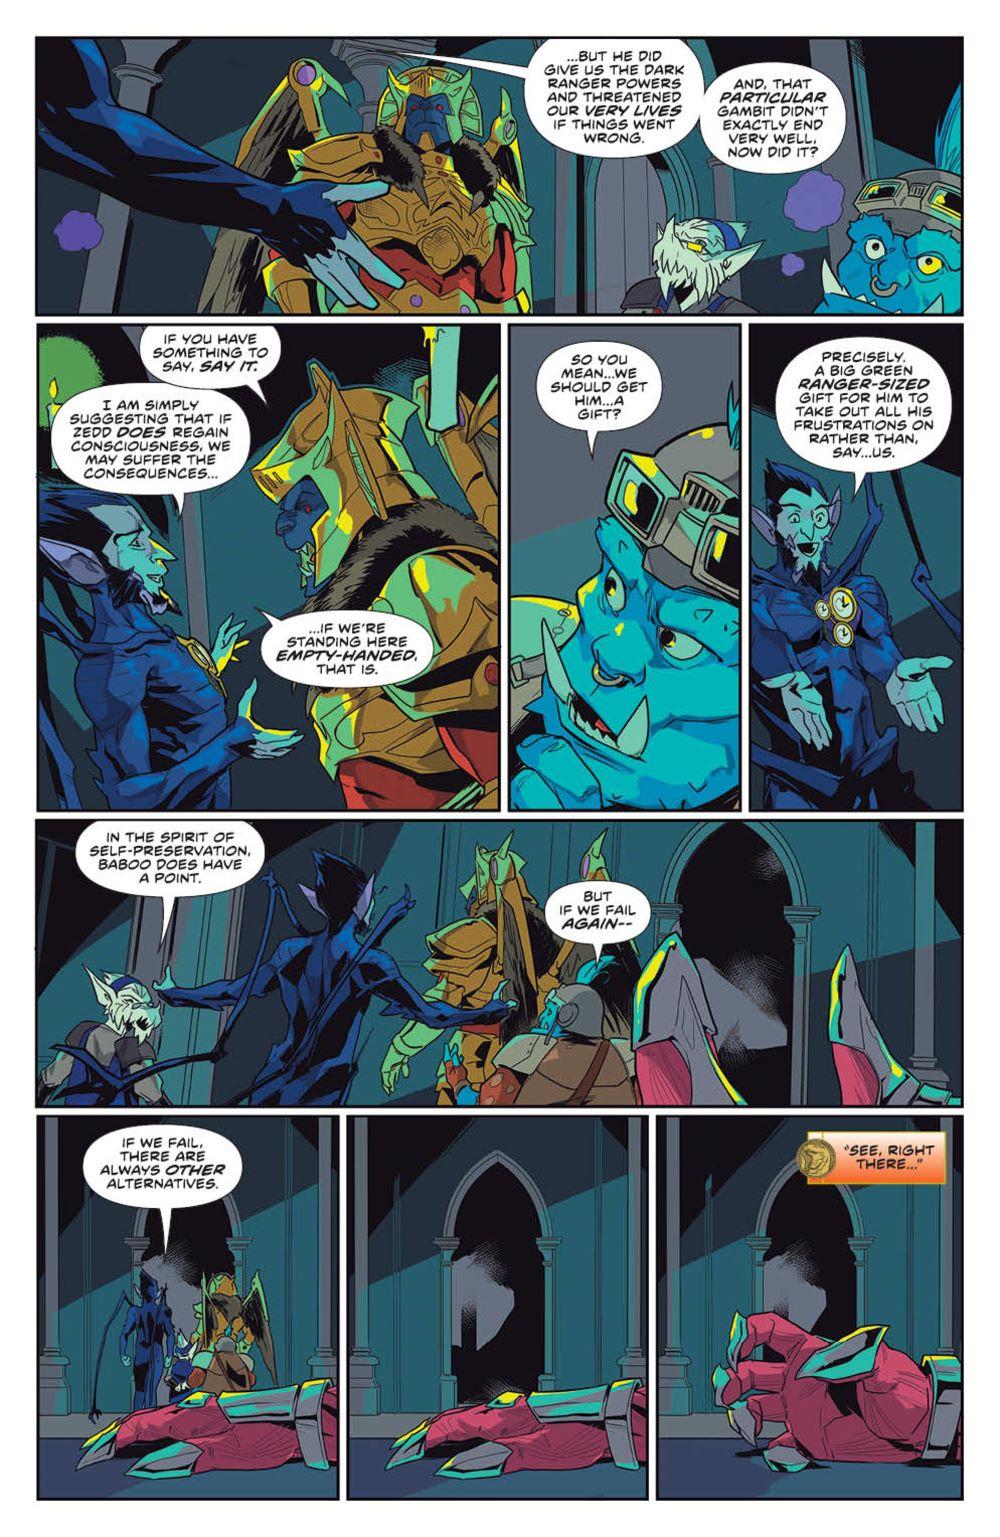 MightyMorphin_v1_SC_PRESS_16 ComicList Previews: MIGHTY MORPHIN VOLUME 1 TP